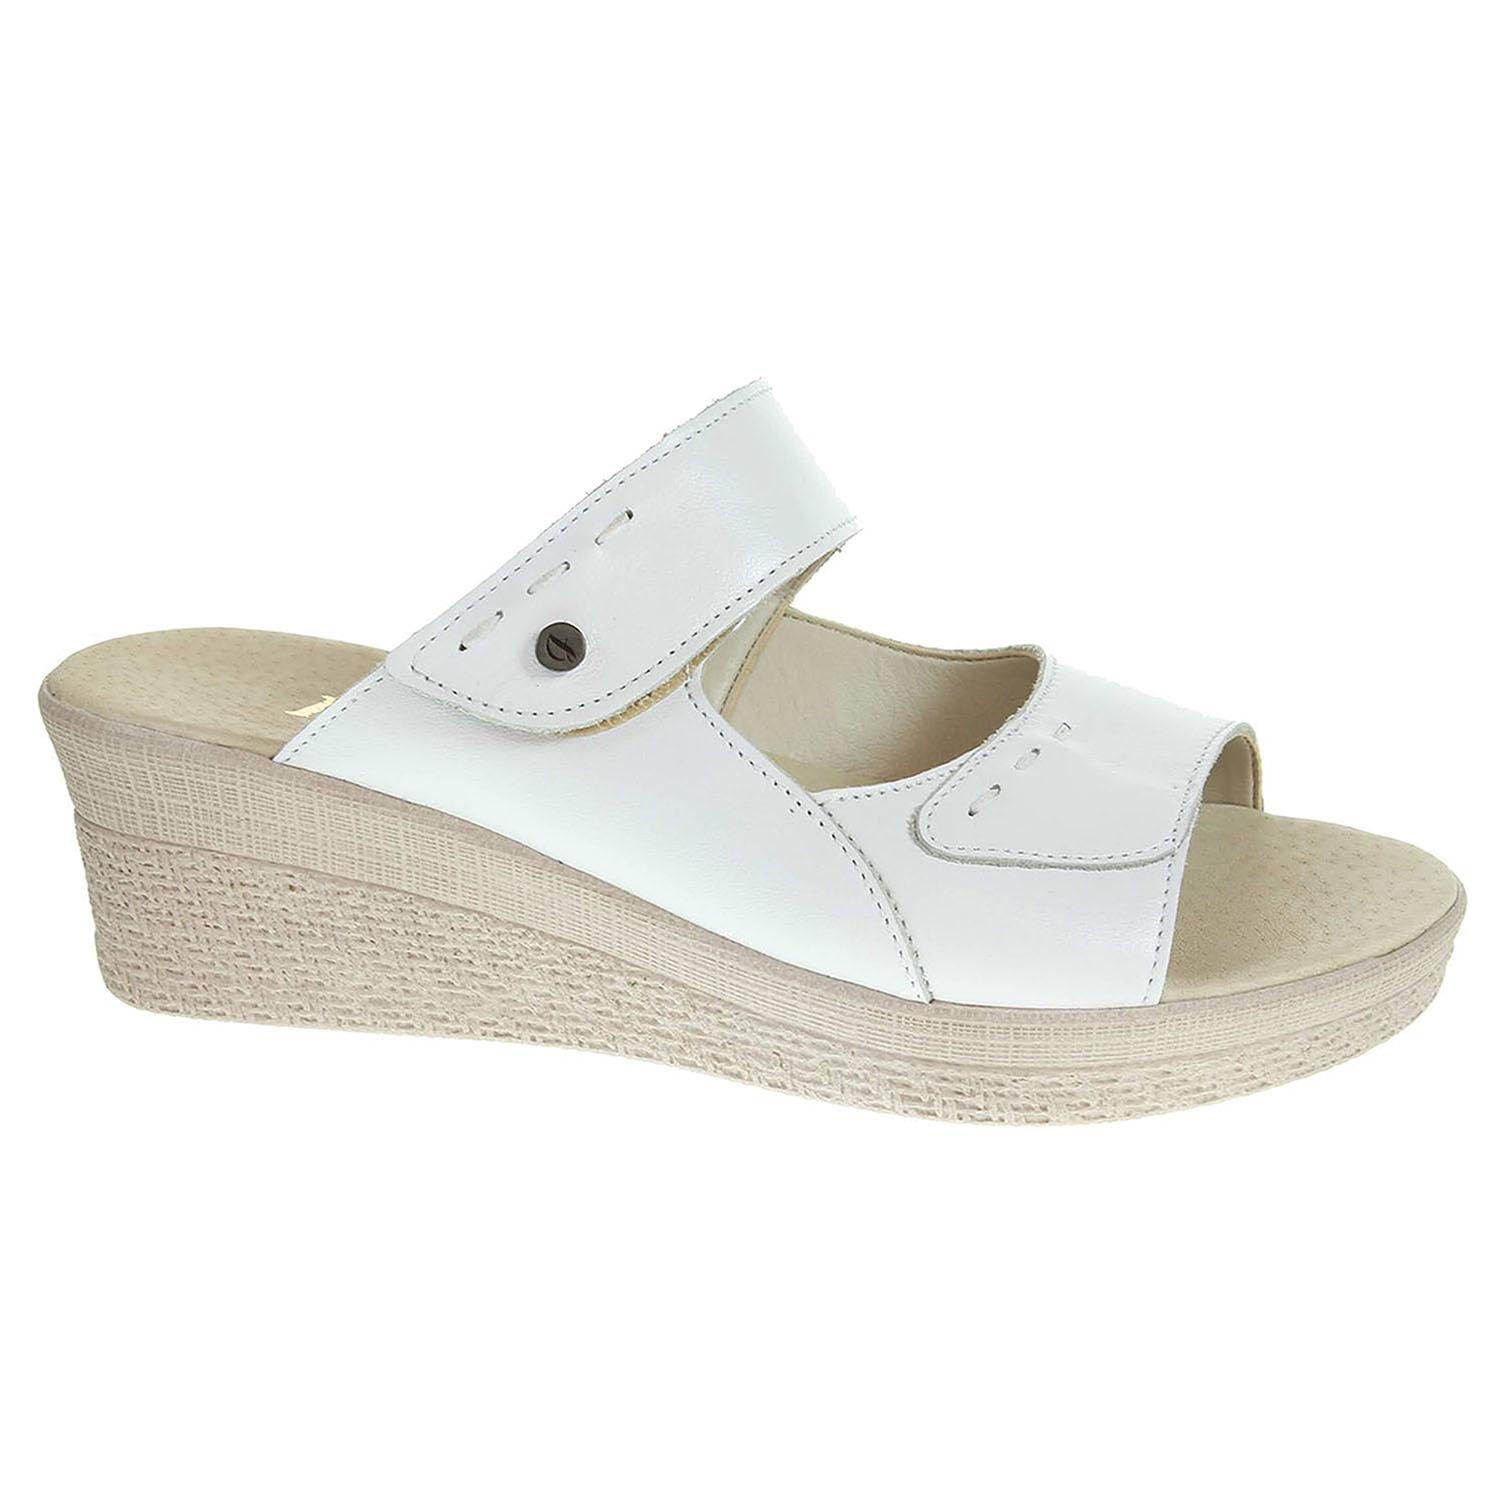 Dámské pantofle J3439 bílé J3439 biela 39